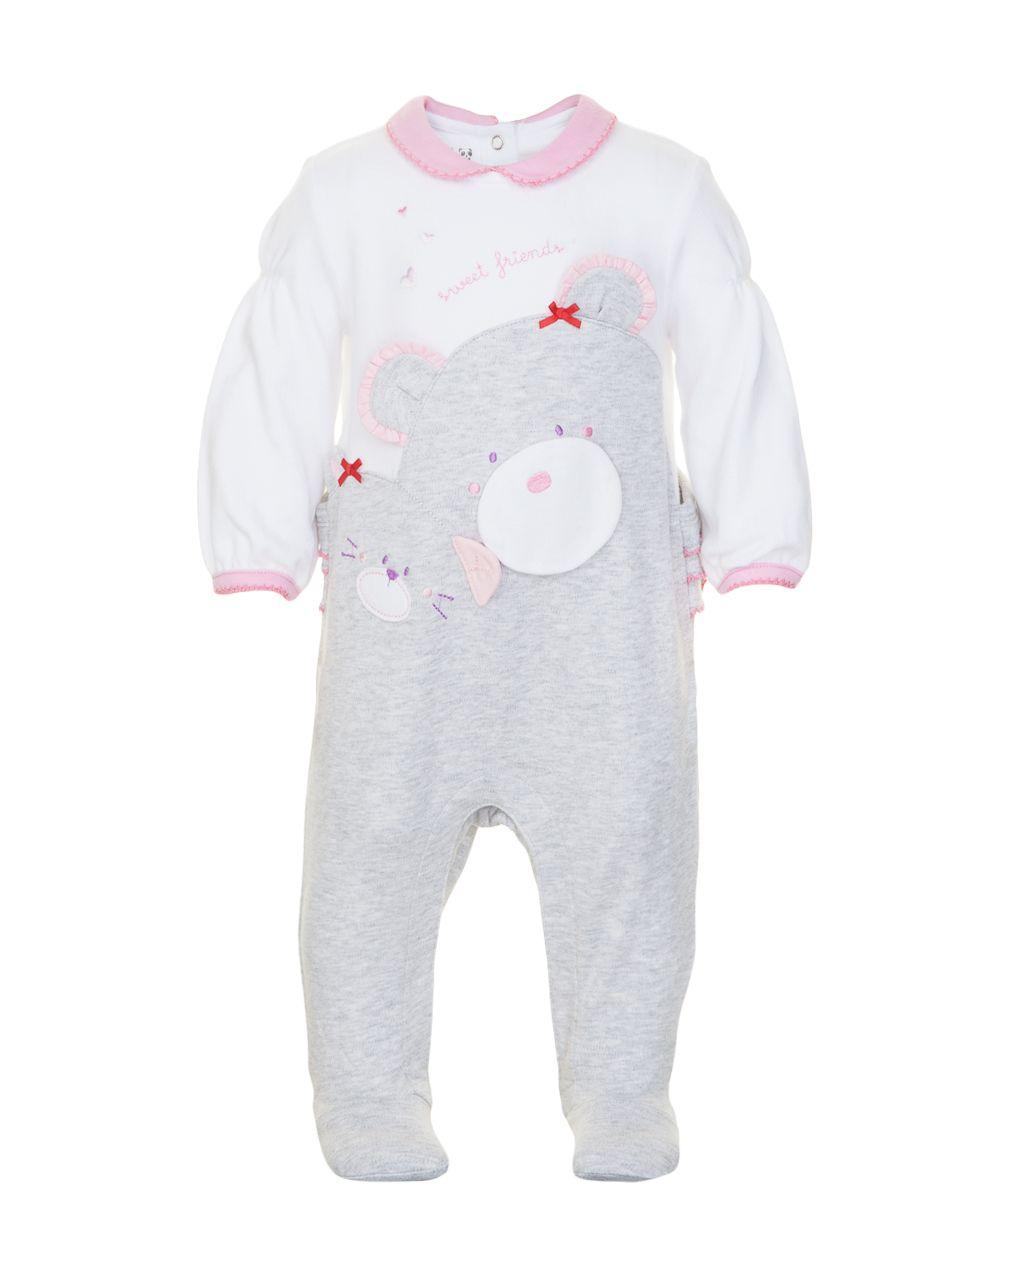 Abiti Eleganti Neonata Online.Pin Su Baby Designer